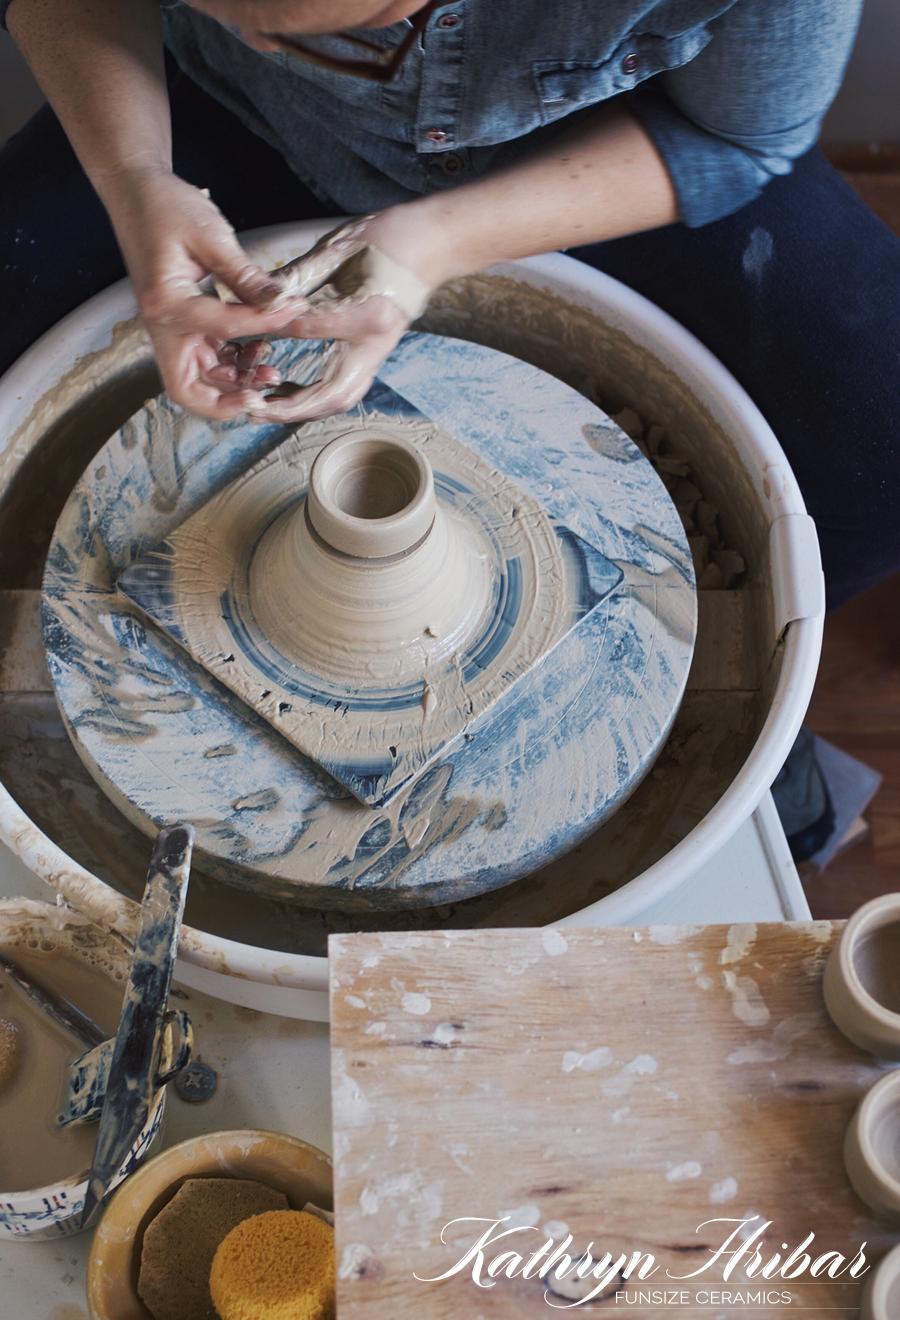 Funsize Ceramics | Kathryn Hribar | Dine X Design